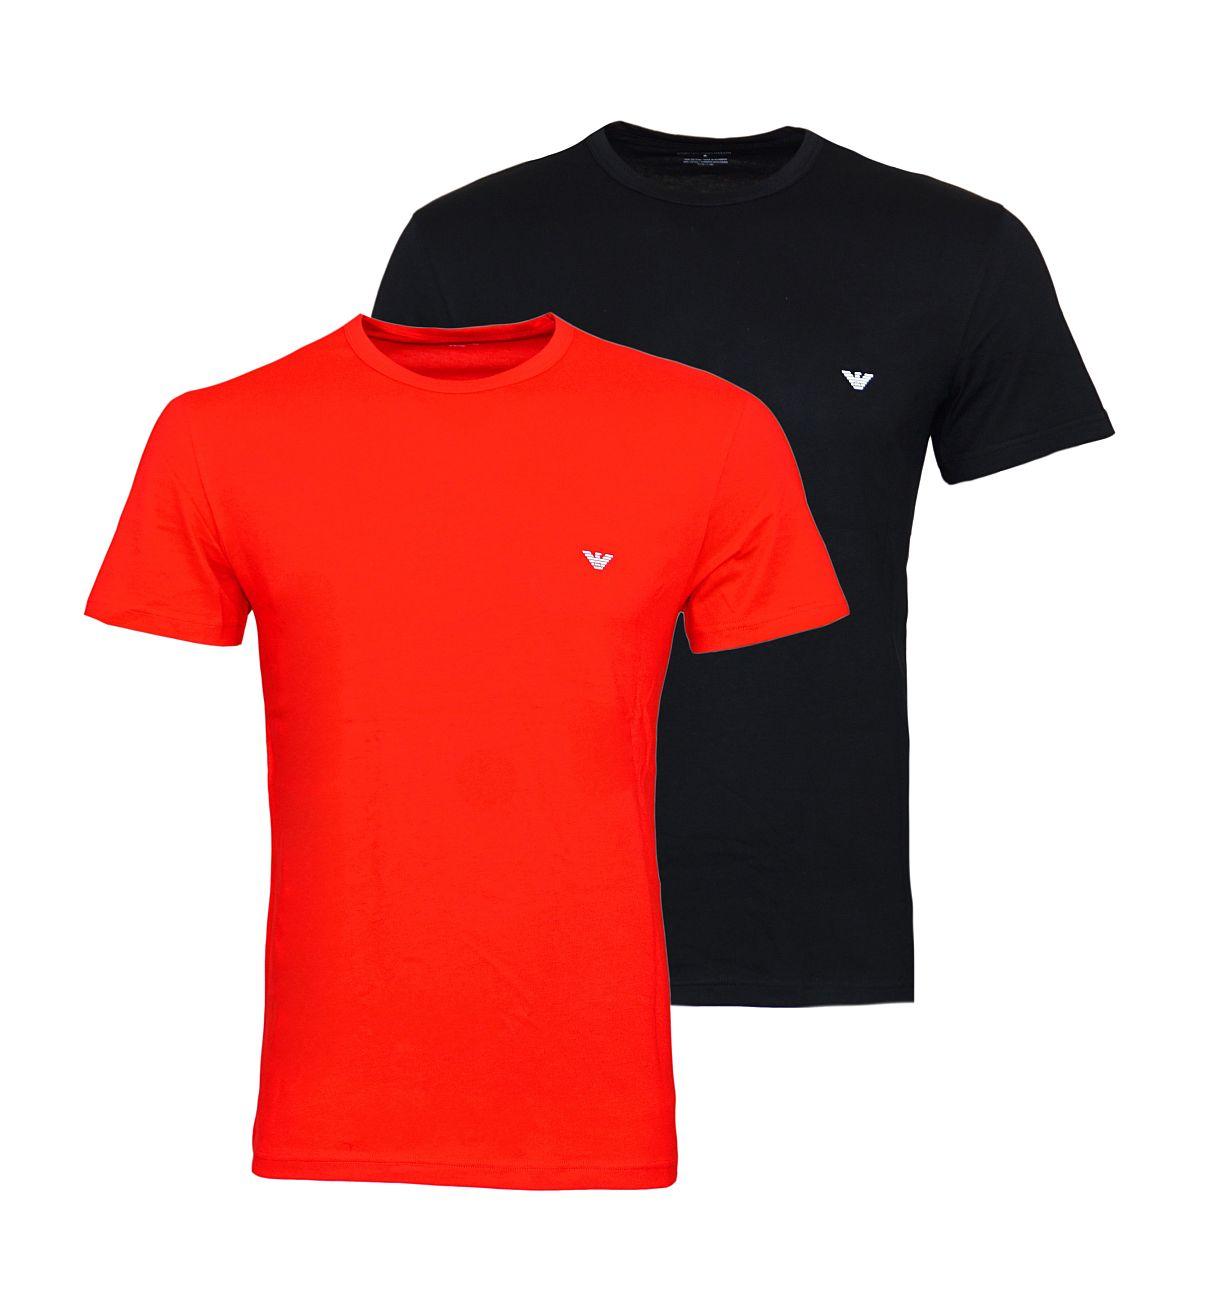 Emporio Armani 2er Pack T-Shirt Rundhals 111267 8P722 40920 NERO/TANGO RED F18-EAT1